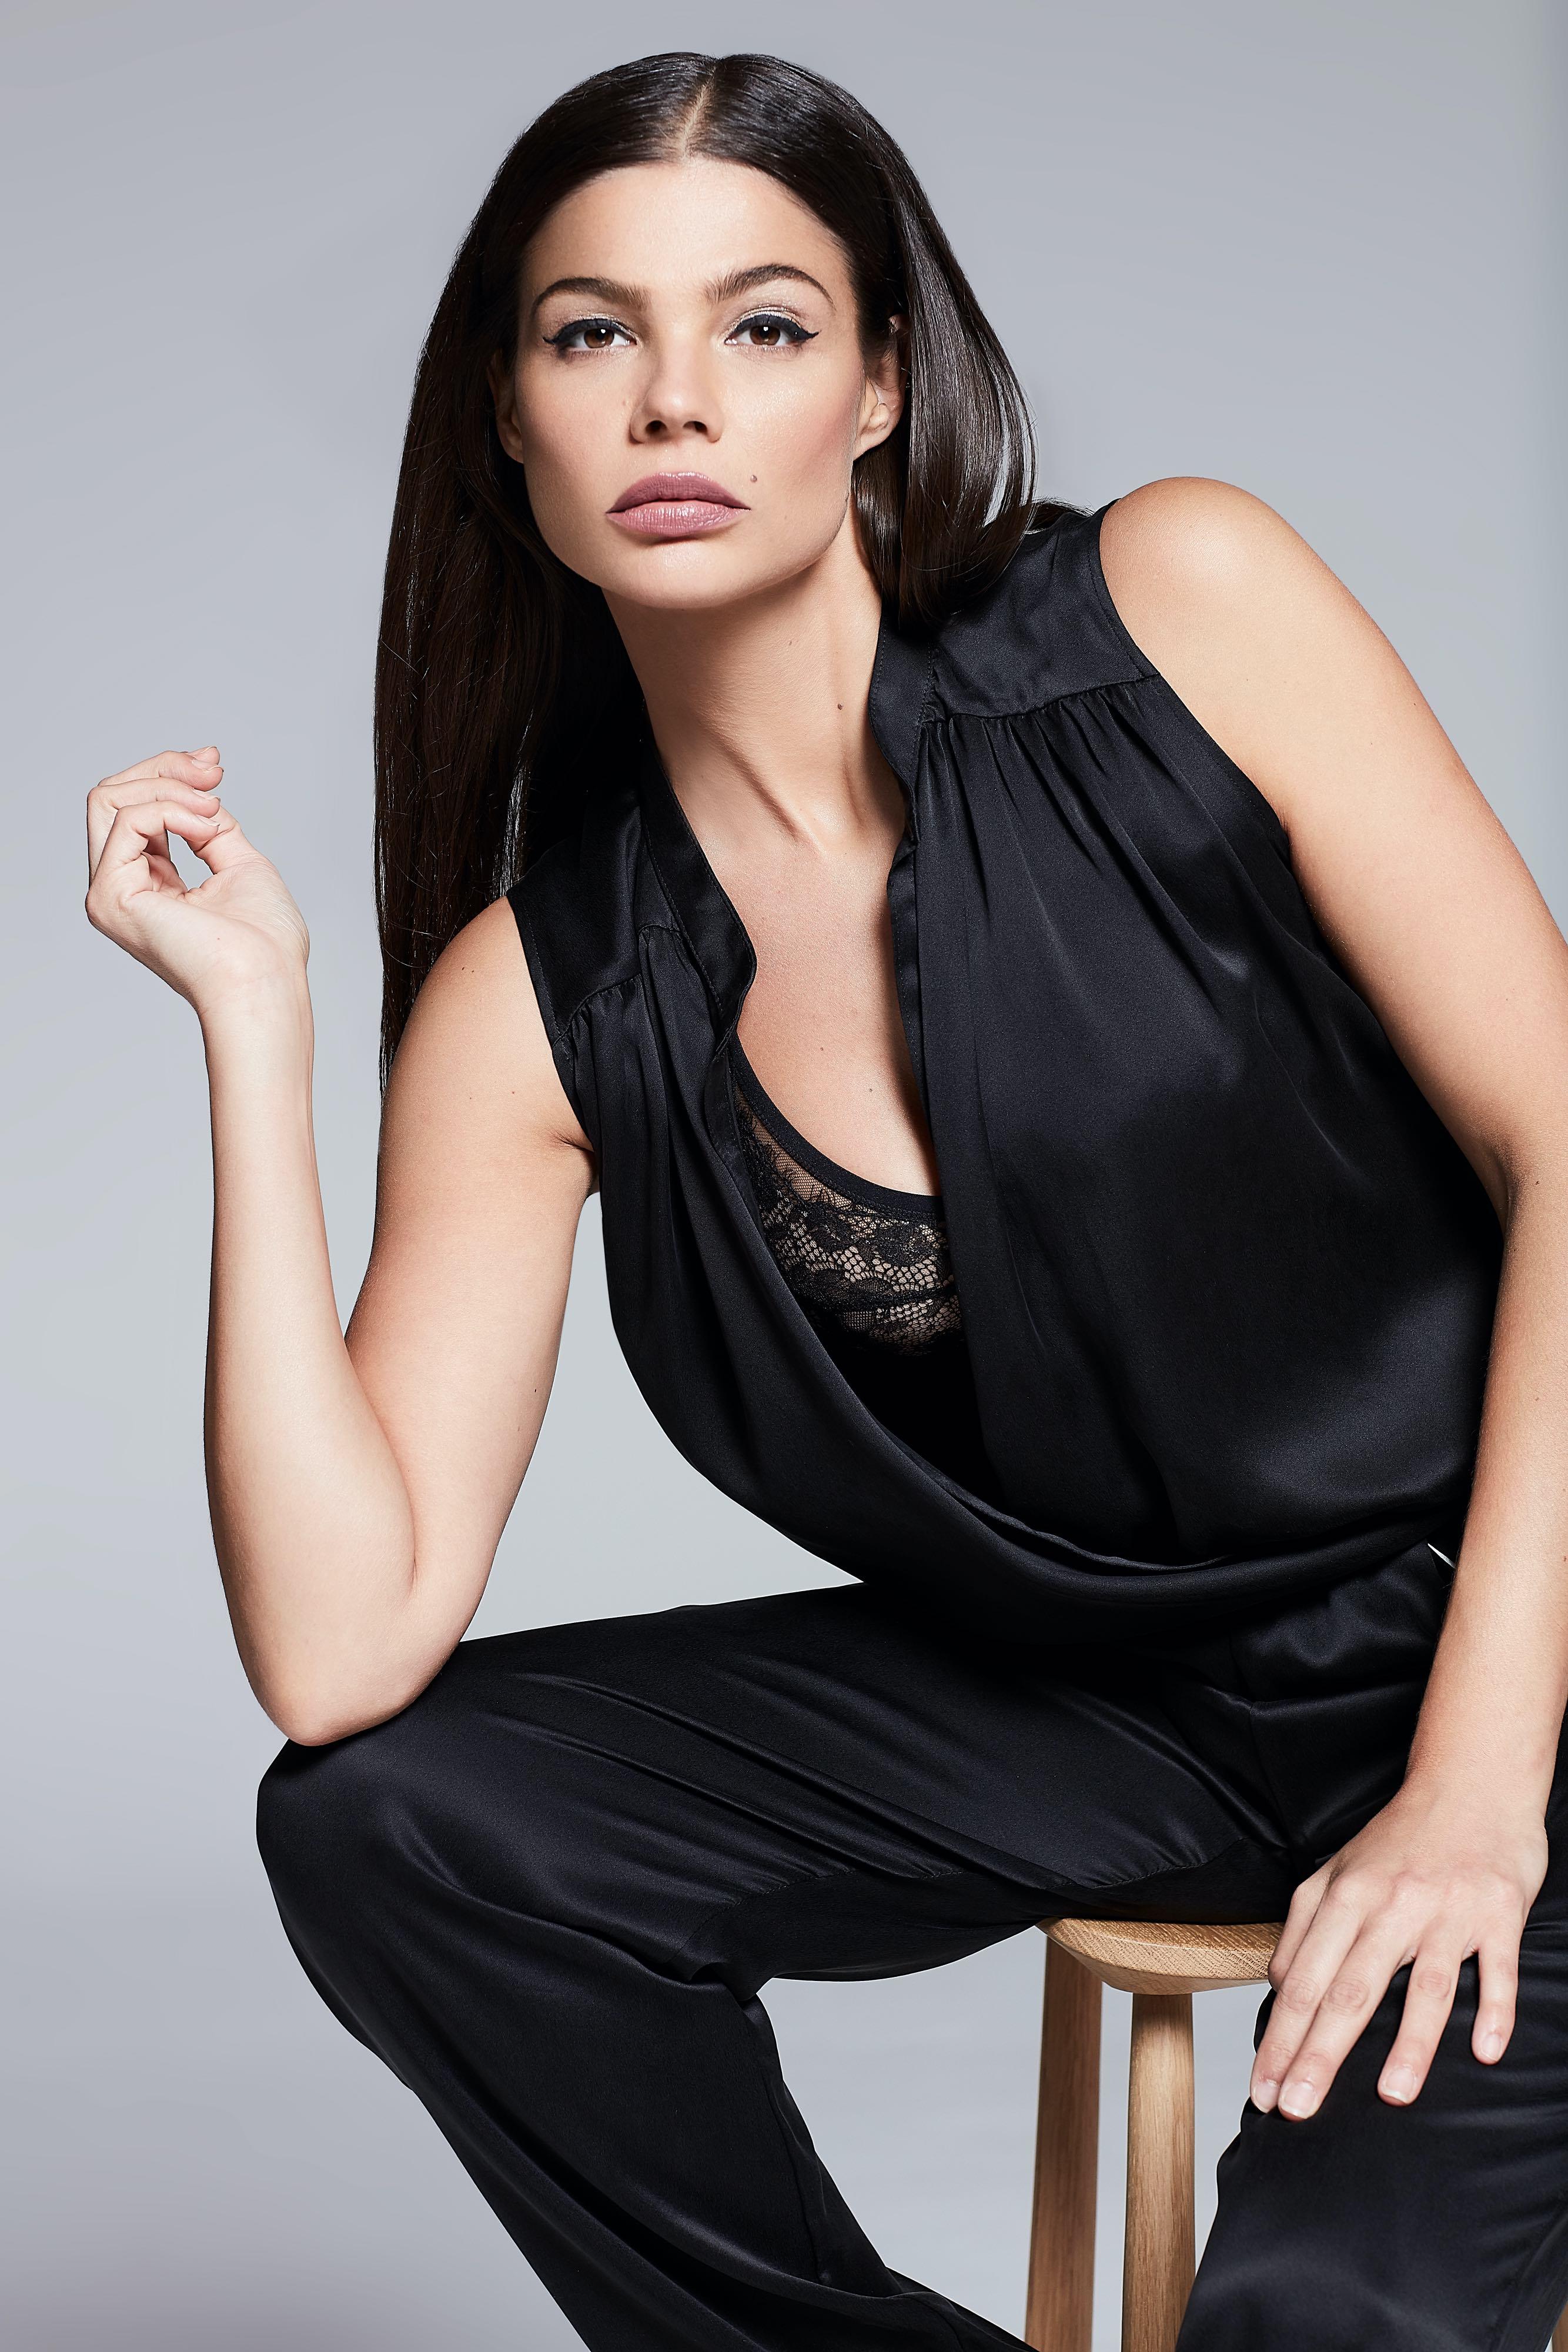 Web-Shine-Female-London-Model-Paula-High-Fashion-03.jpg#asset:51426